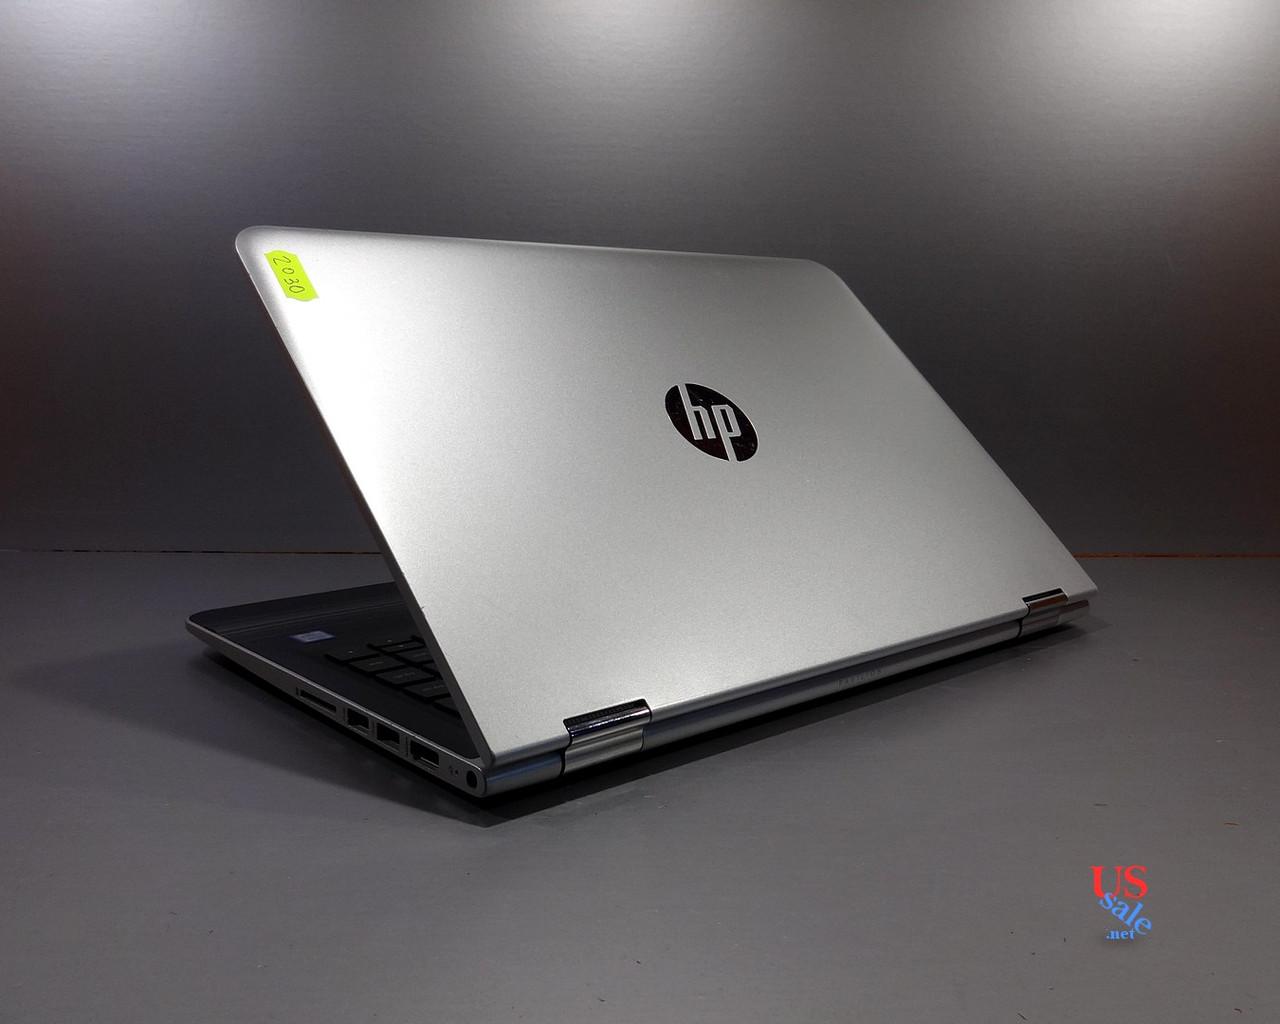 "Ноутбук HP Pavilion x360 m3-u001dx 13.3"" Intel Core i3-6100u 2.3 GHz, 6Gb DDR4, 1Tb. Гарантія!"